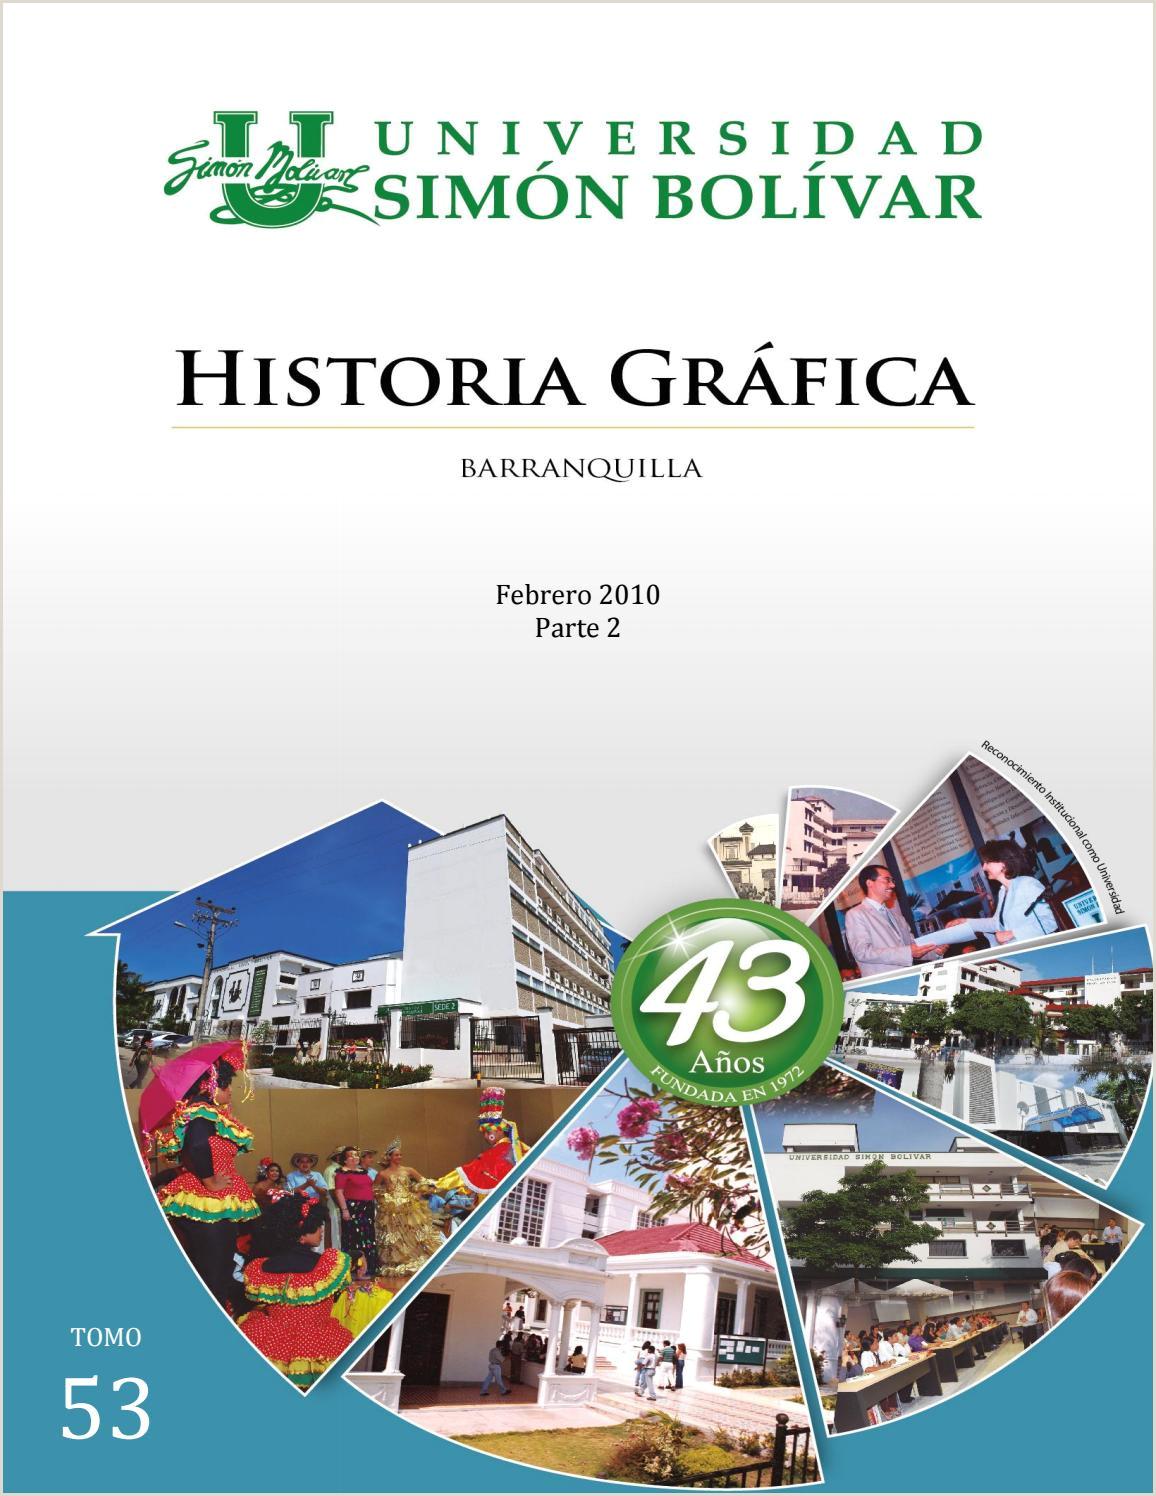 Formato Hoja De Vida Hospital Federico Lleras Acosta tomo 53 Parte 2 by Universidad Simon Bolivar issuu